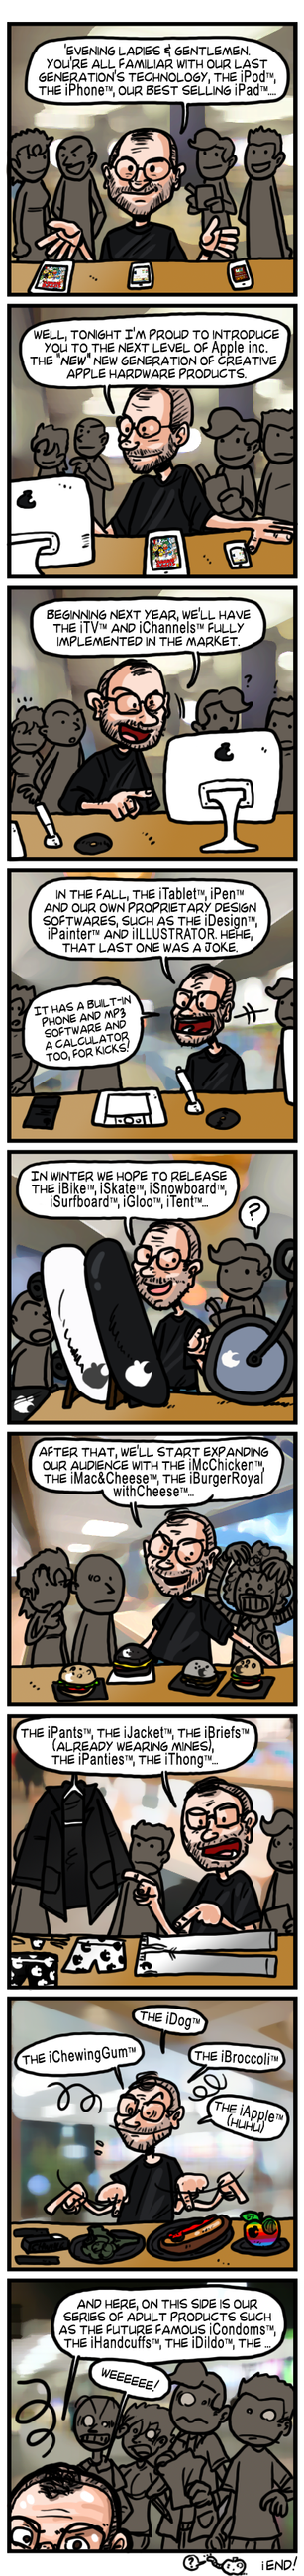 COMIX Steve Jobs by theEyZmaster